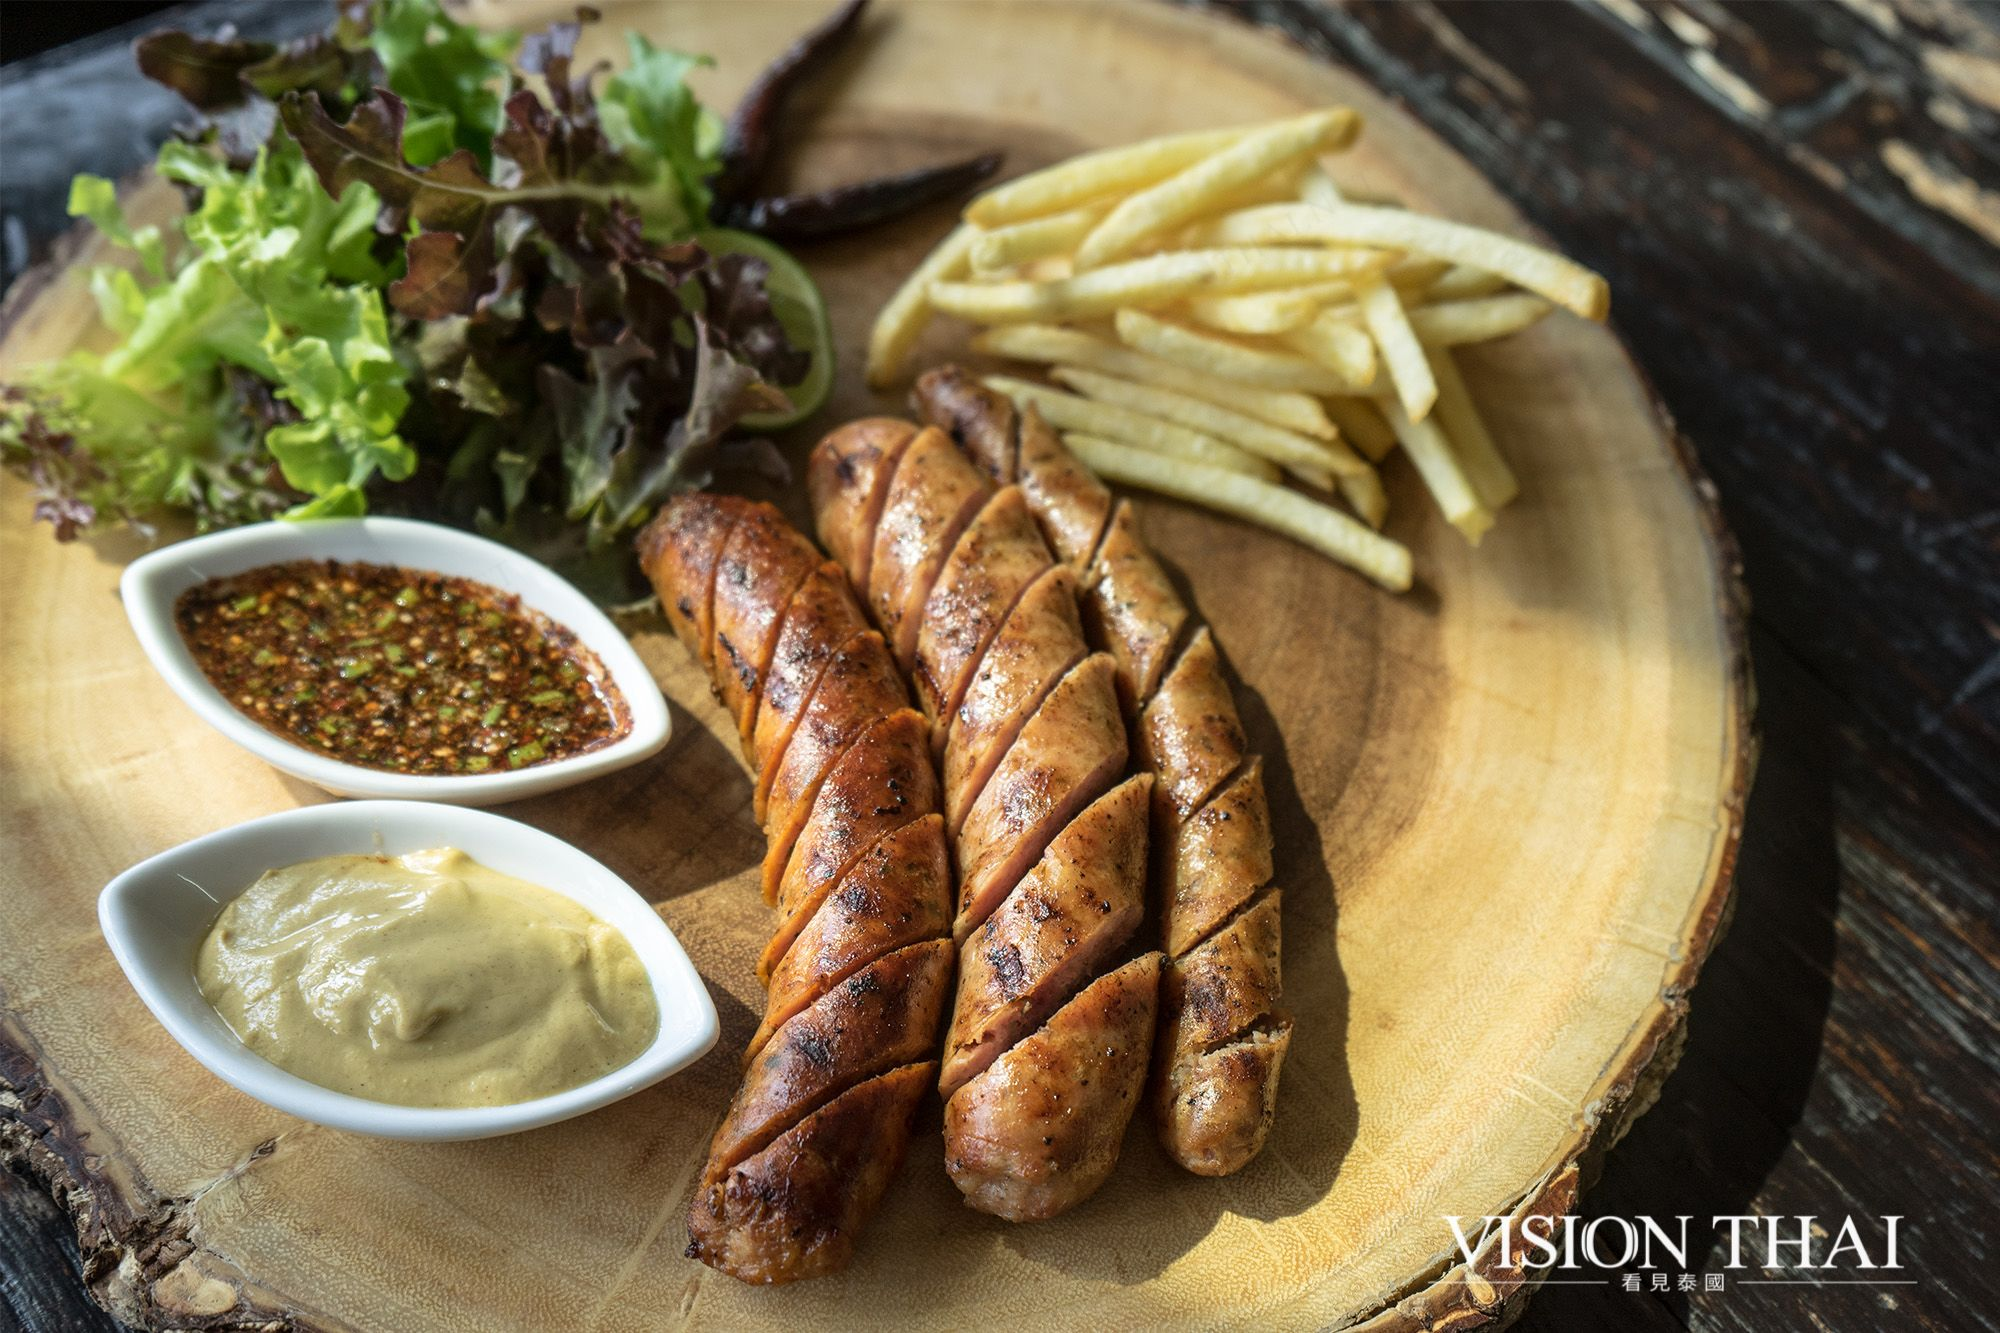 RCB 河岸餐廳 曼谷河城藝術古董中心 Viva Aviv River 歐式 比瓦·阿维夫河岸餐廳